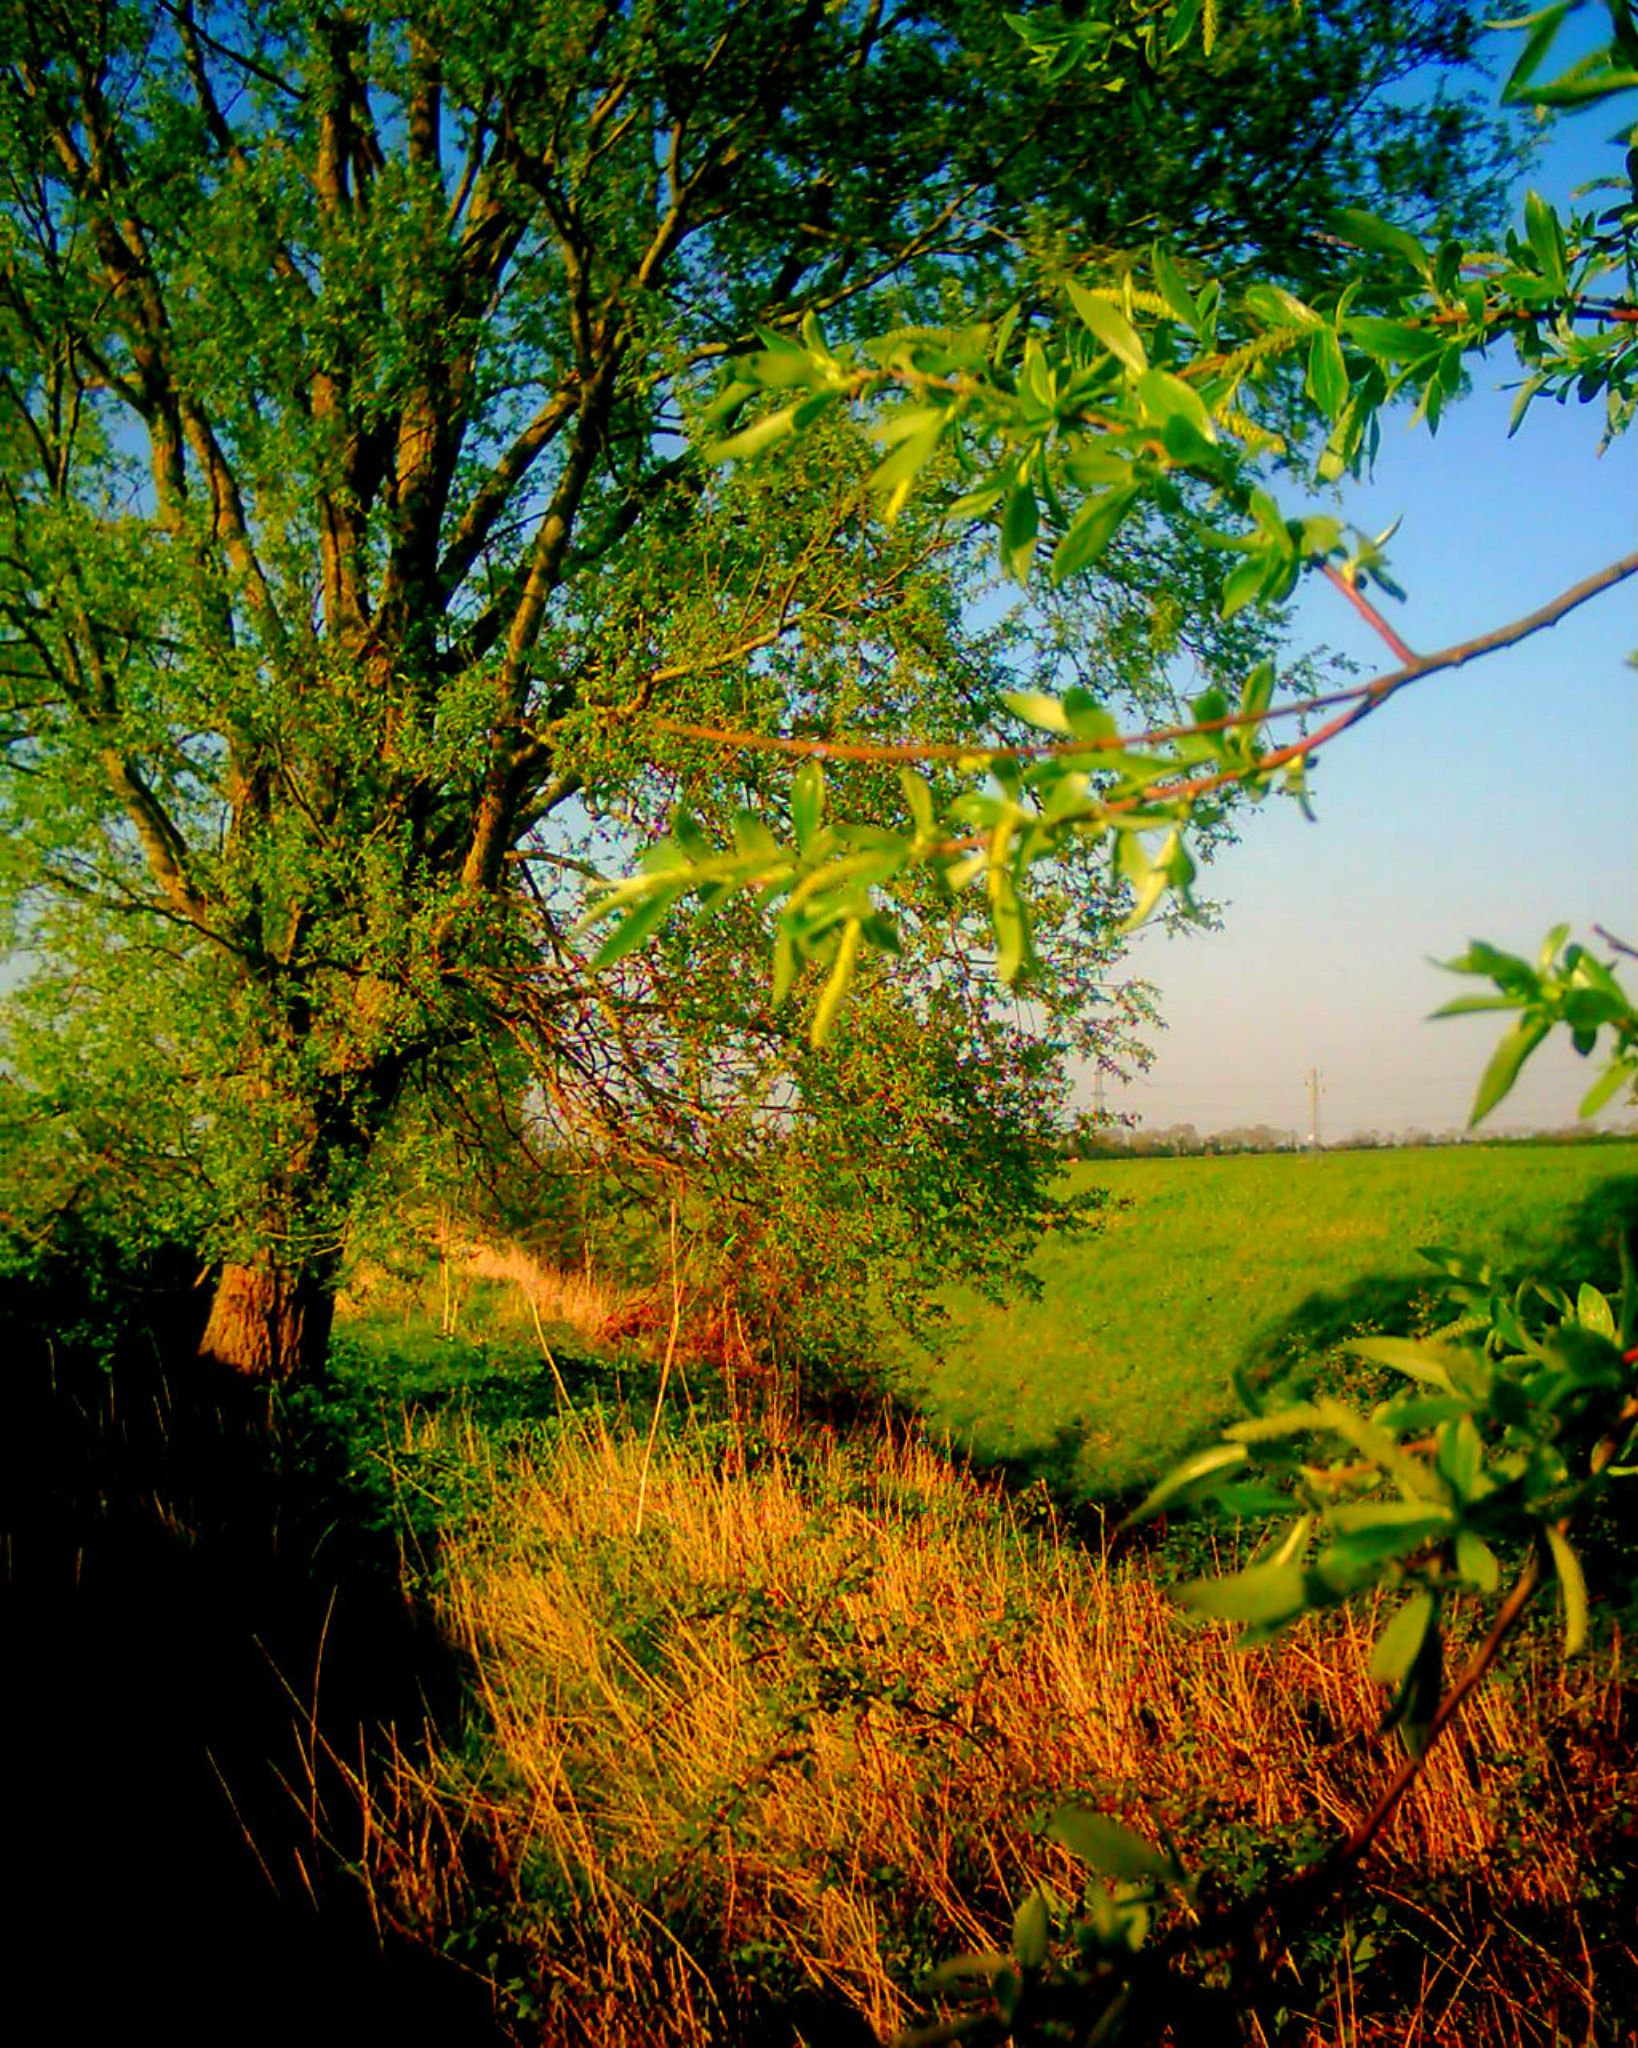 lincolshire fens by chris.adams.3557